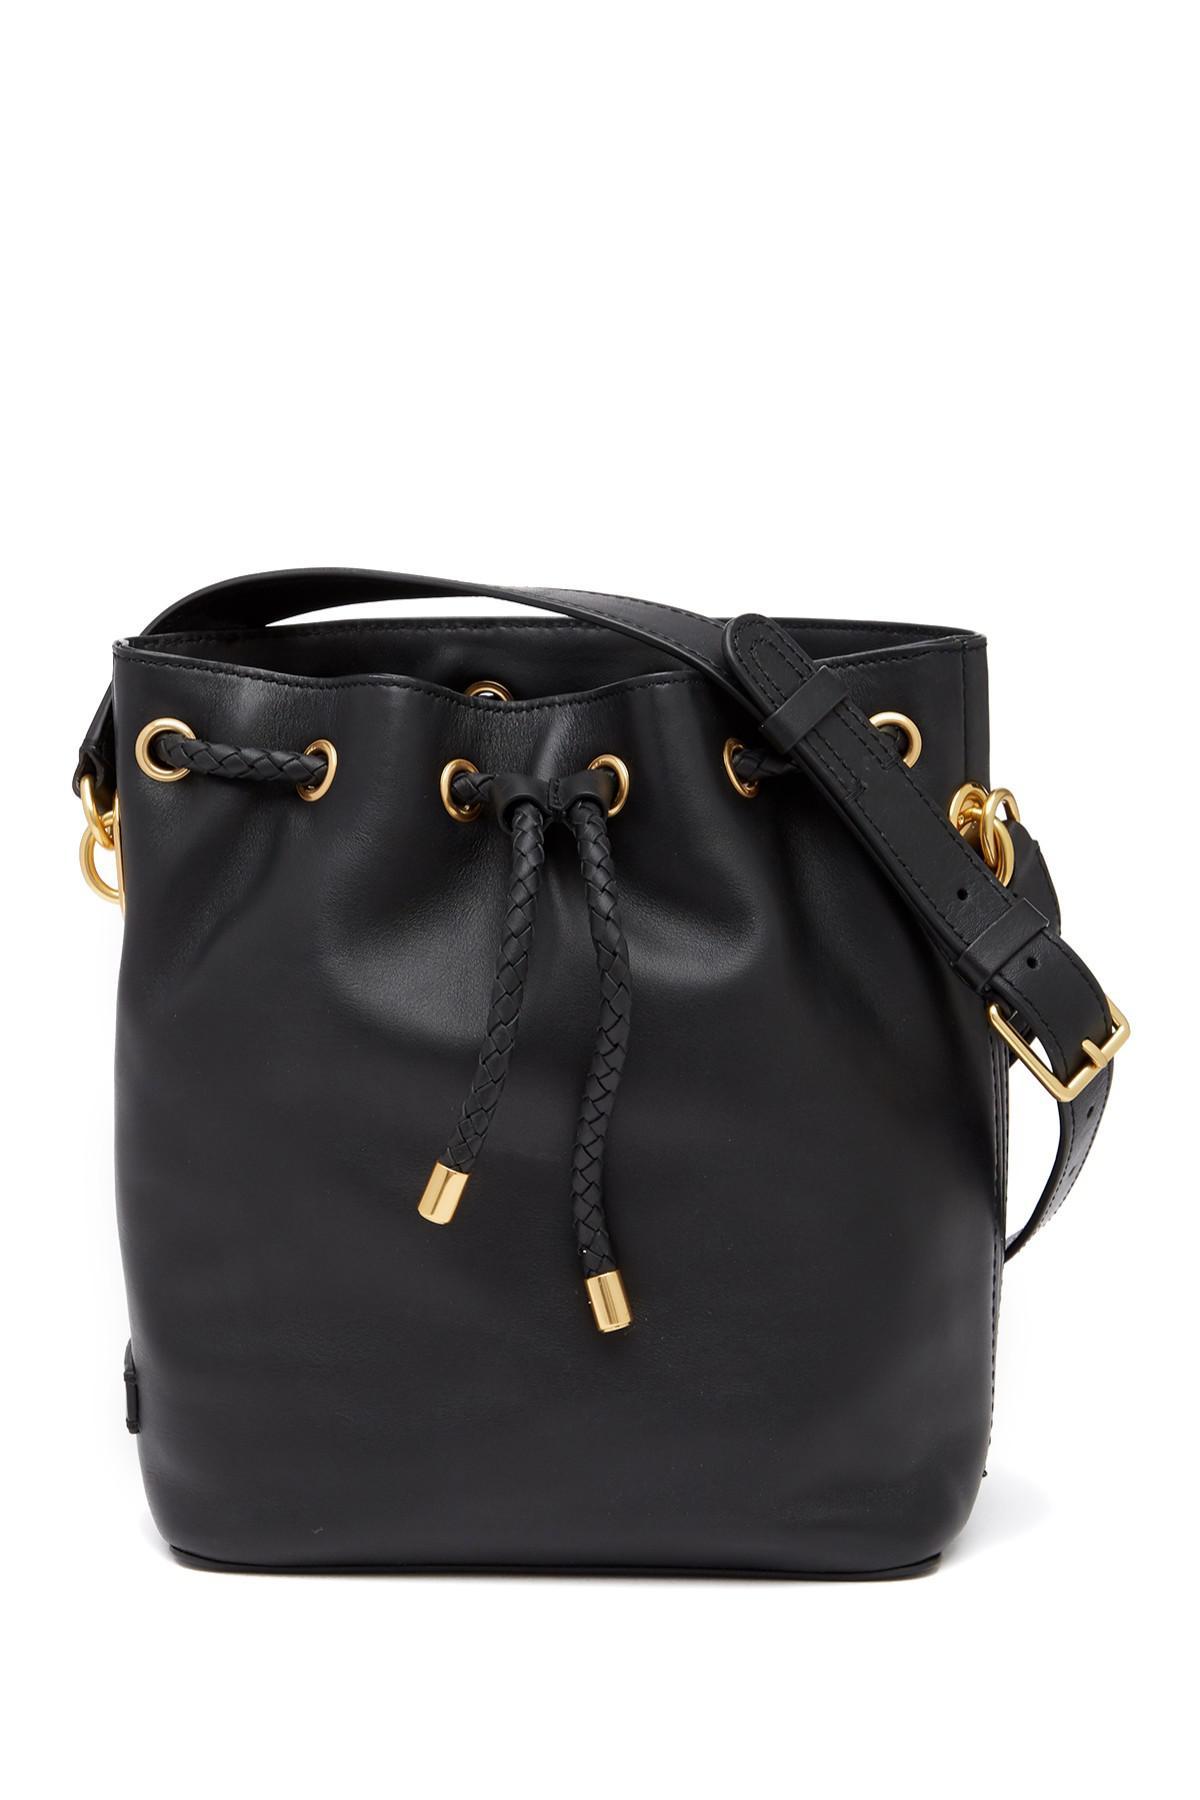 Lyst - Cole Haan Benson Ii Leather Drawstring Bucket Bag in Black d6efaddd8d